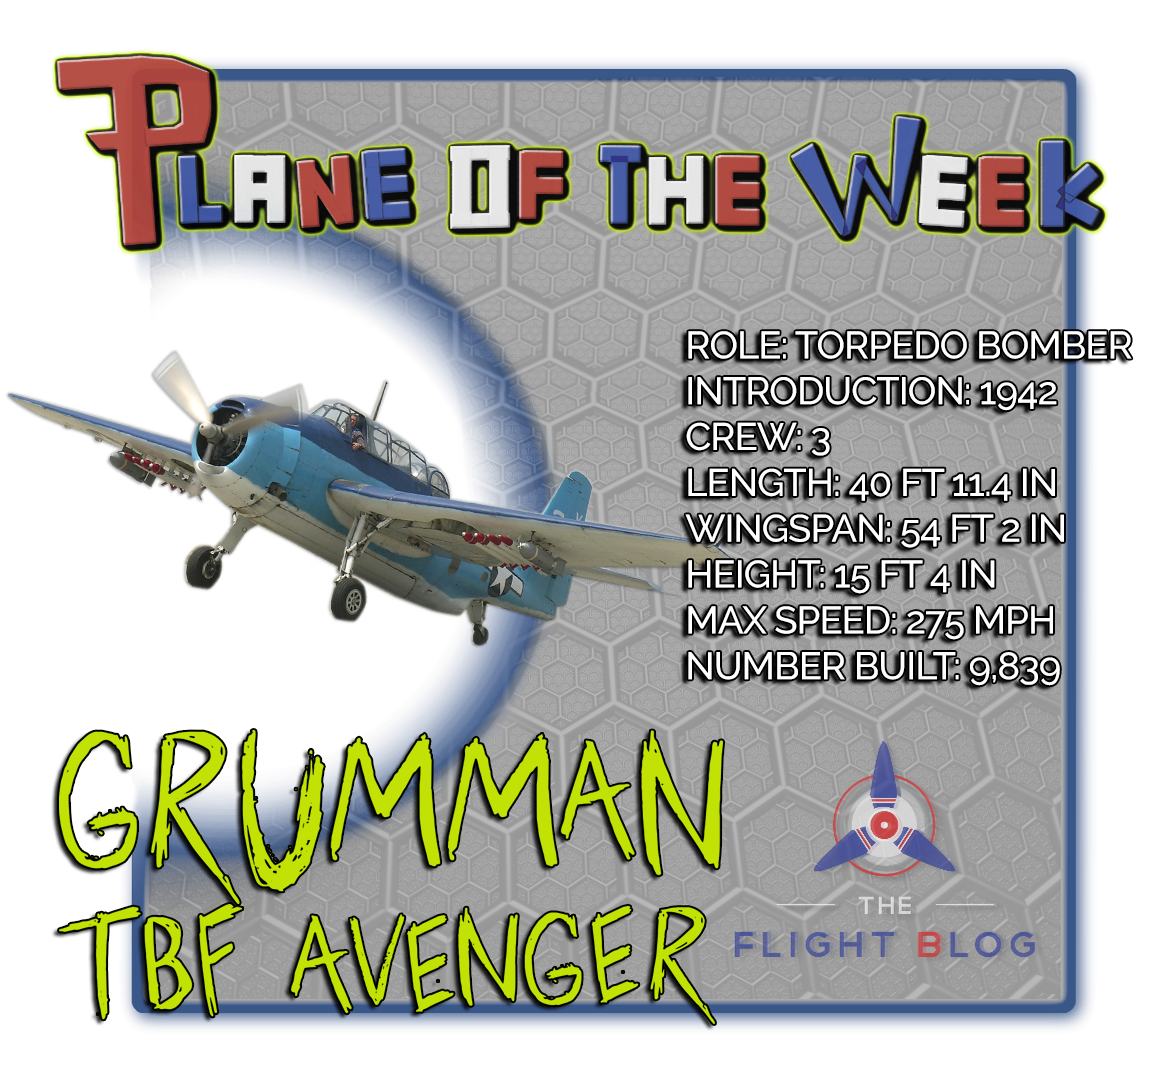 Grumman TBF Avenger, grumman avenger, wwII bomber, Grumman avenger specs, avenger specs